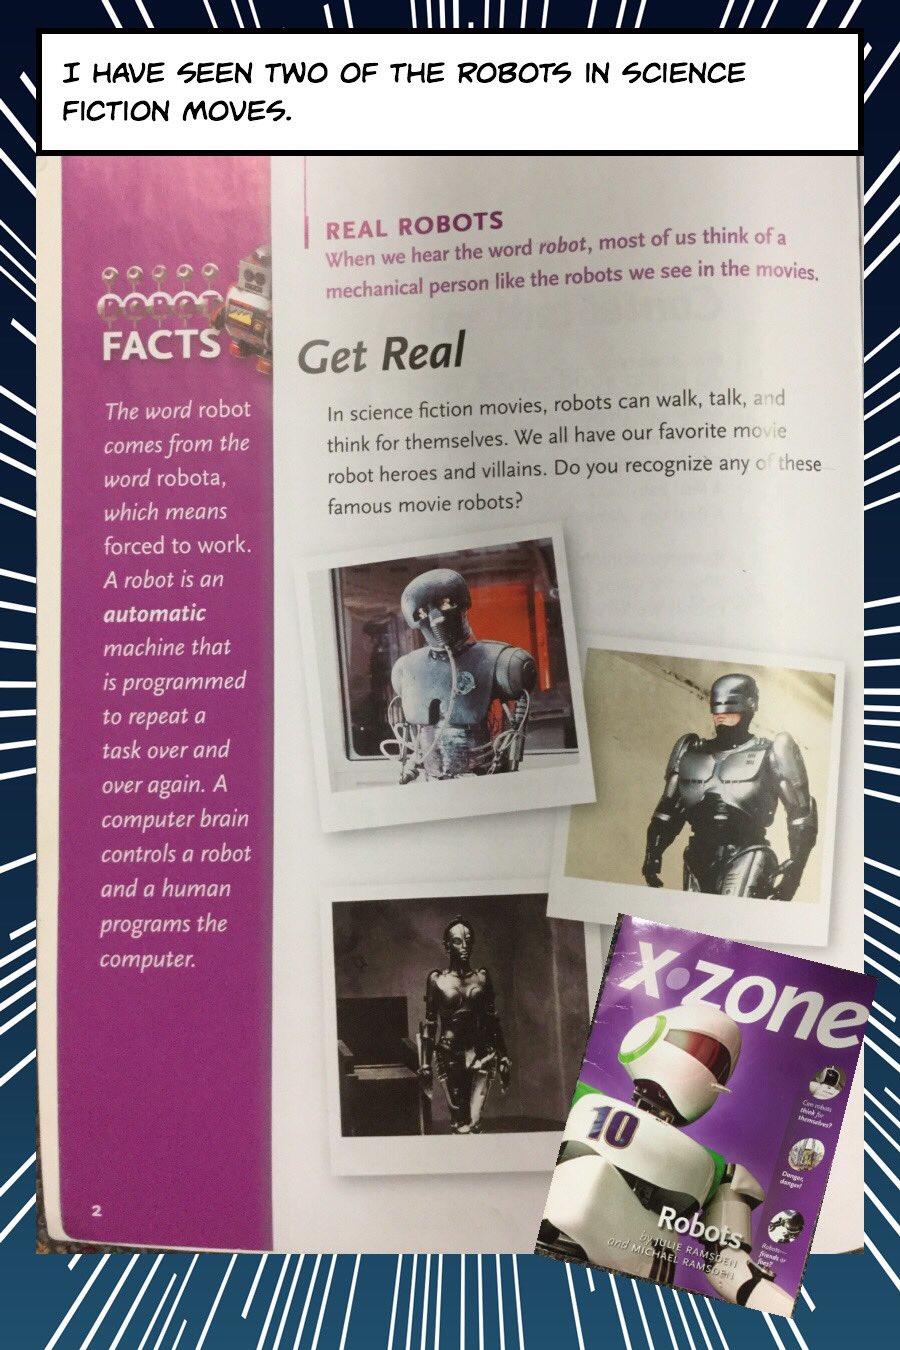 #BookSnapswk2 #bookSnaps LC_3S read XZone Robots @BrookeBsulzmann #betl https://t.co/p1ubYCozLQ